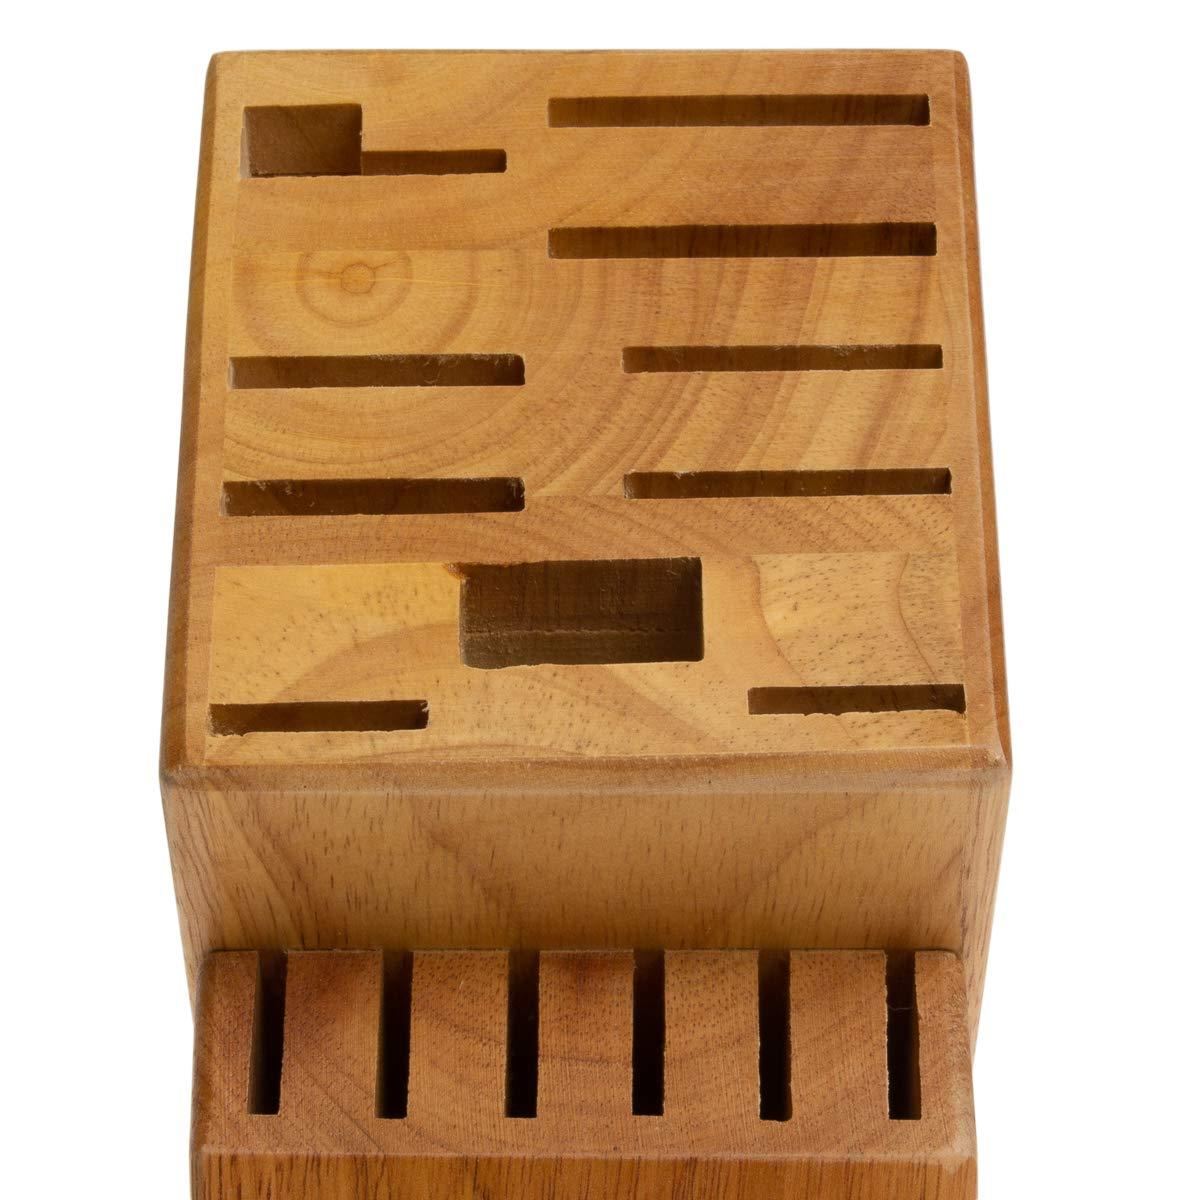 Hampton Forge 16-Slot Empty Cutlery Block, Wood, HMC01B016G by Hampton Forge Cutlery (Image #2)